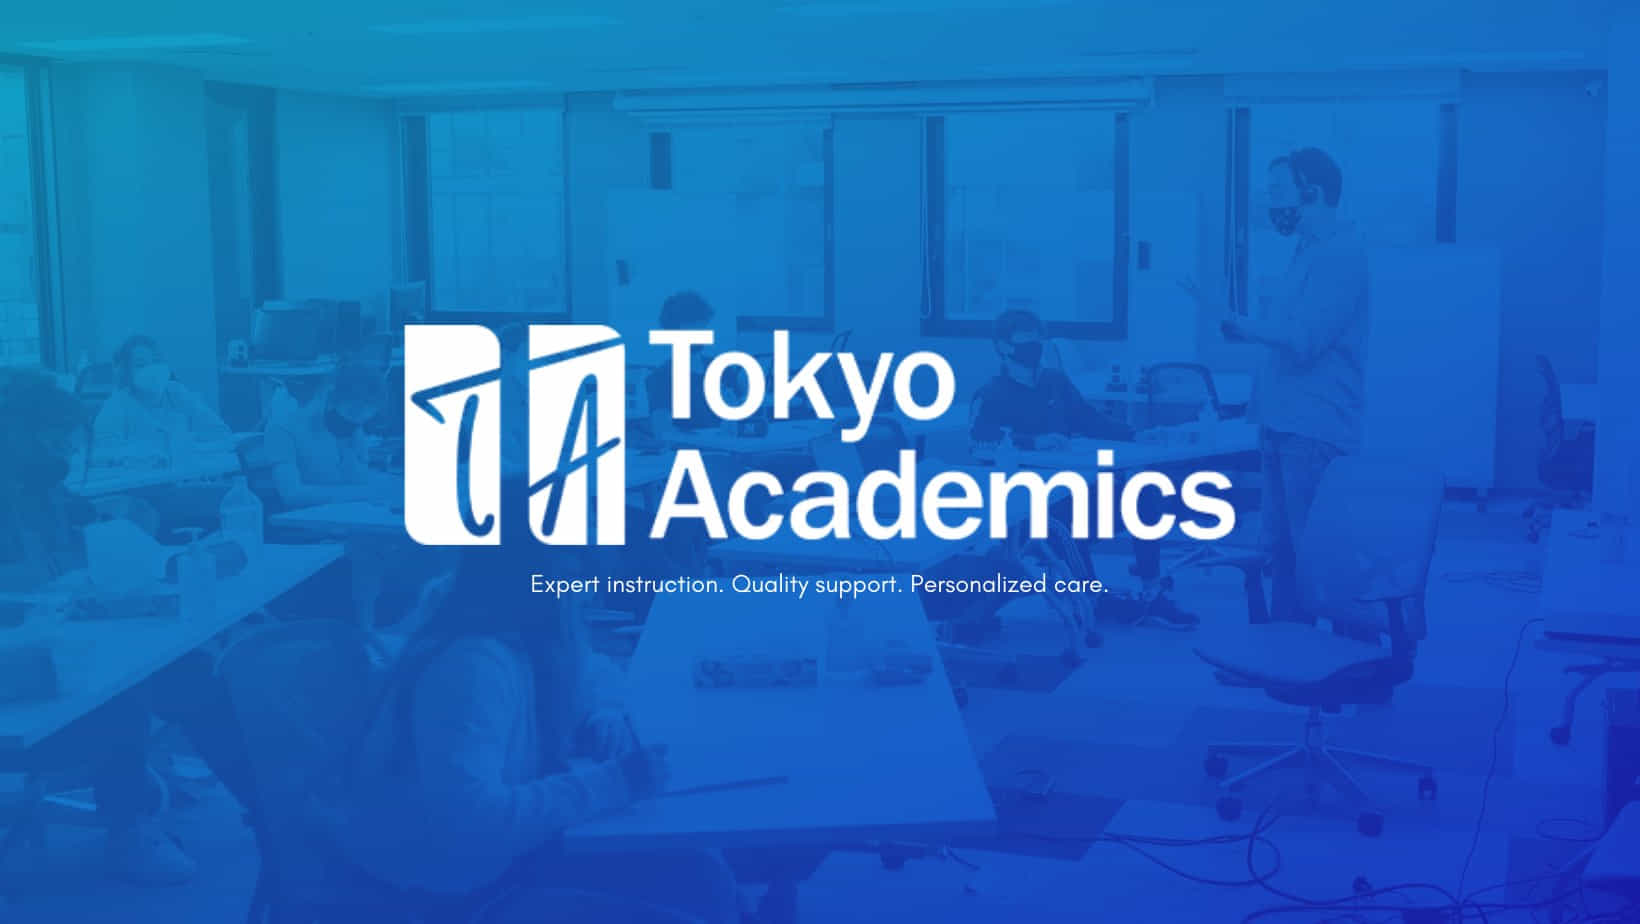 Lowongan Kerja Full Remote English (Online Vocabulary) Tutor (Tokyo Academics)